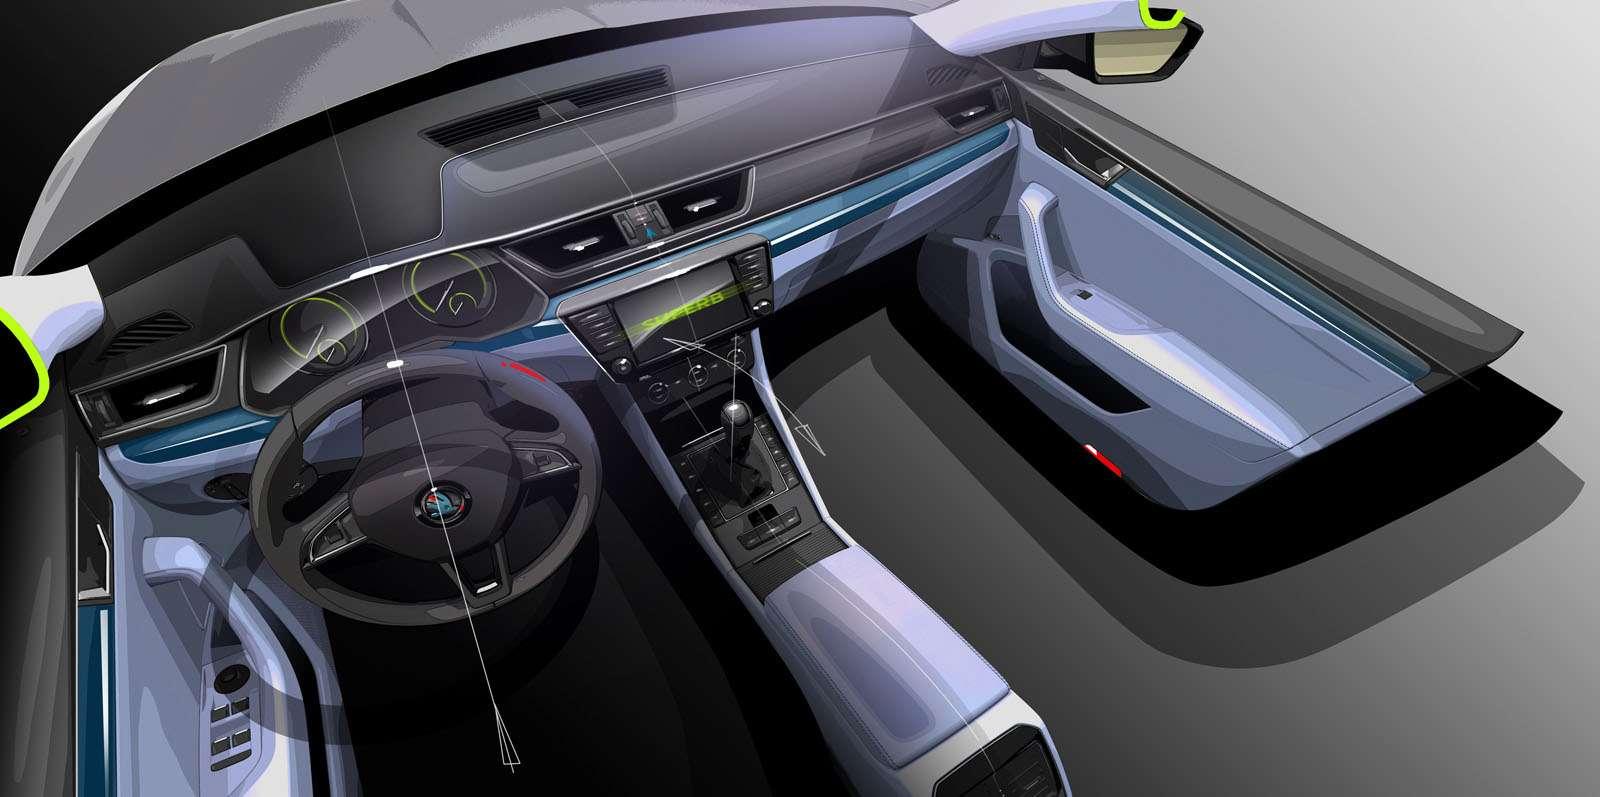 150203 SKODA Superb Interior Design Sketch